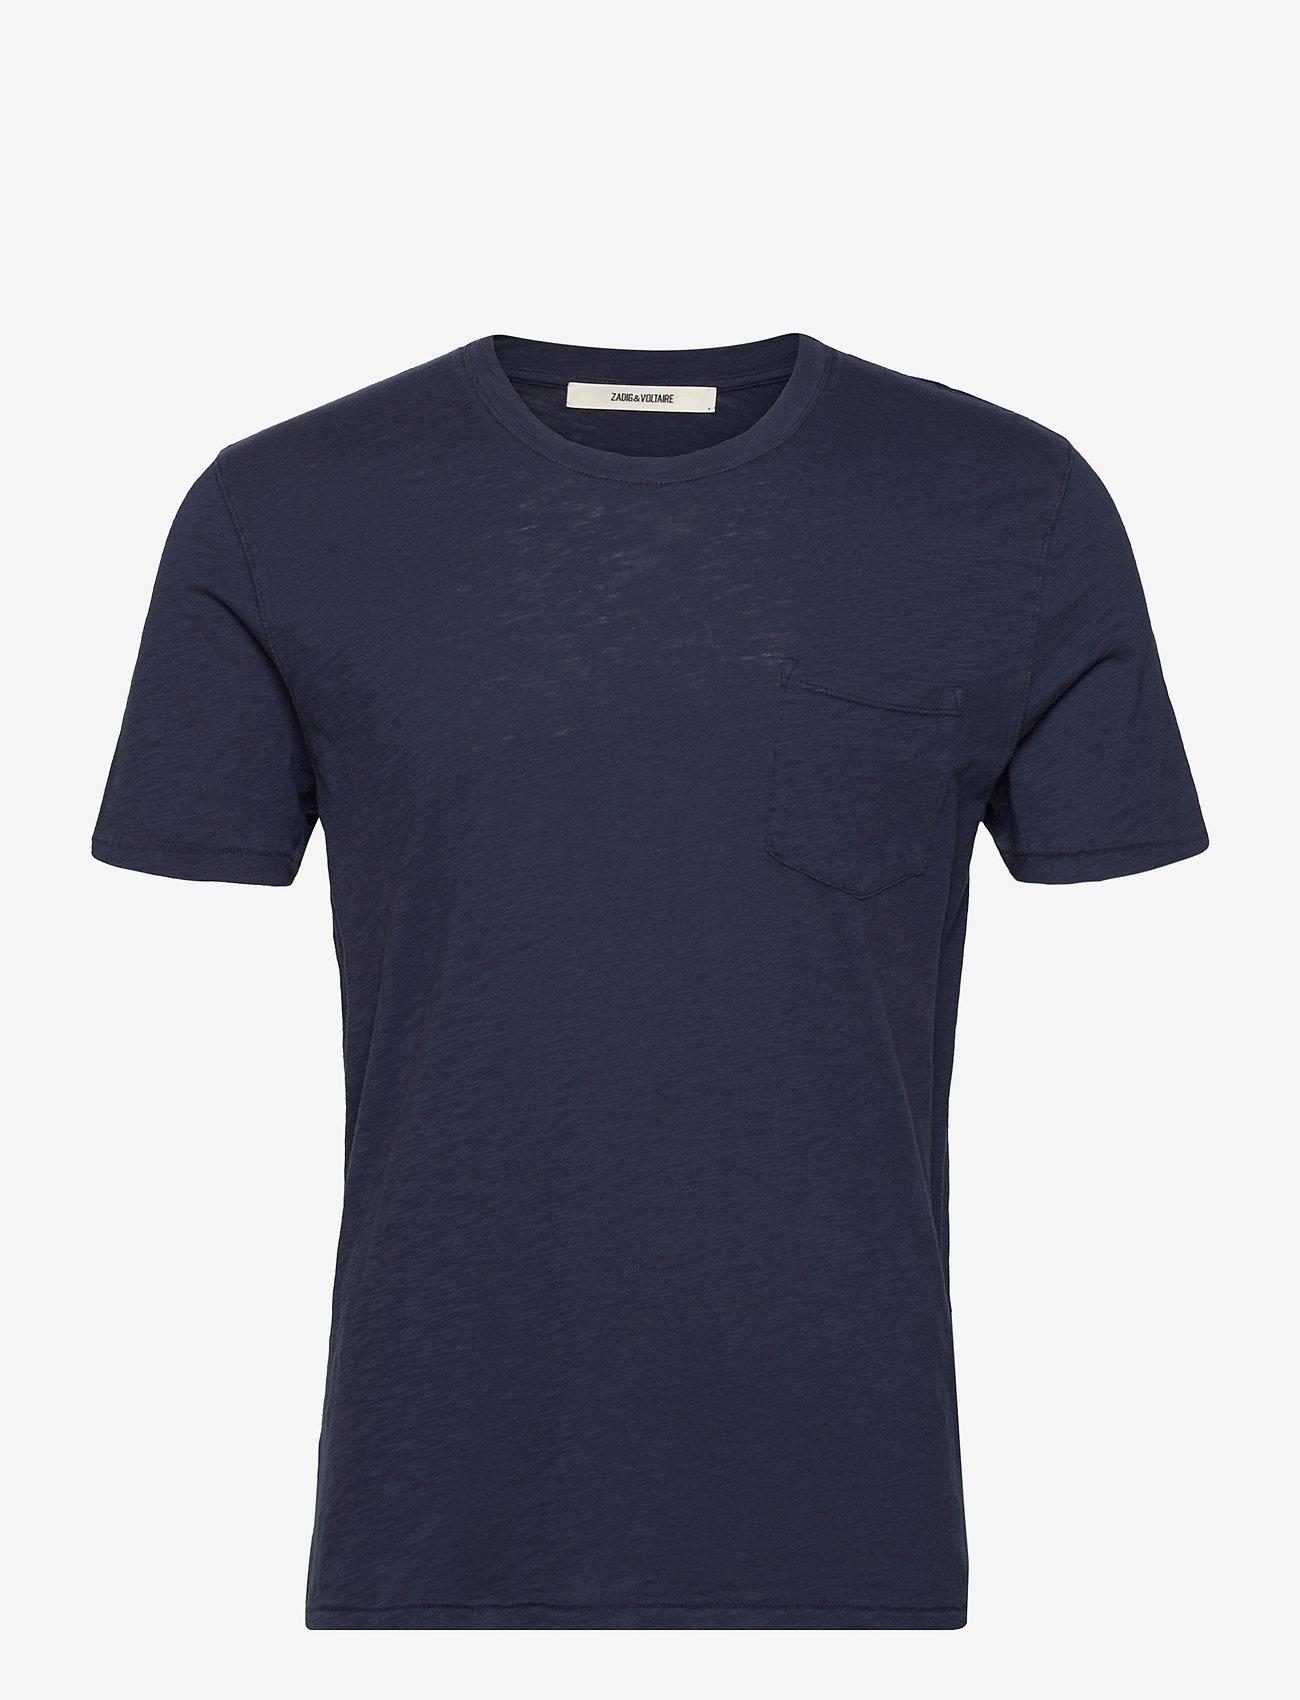 Zadig & Voltaire - STOCKHOLM COTTON SLUB - basic t-shirts - navy blue - 1